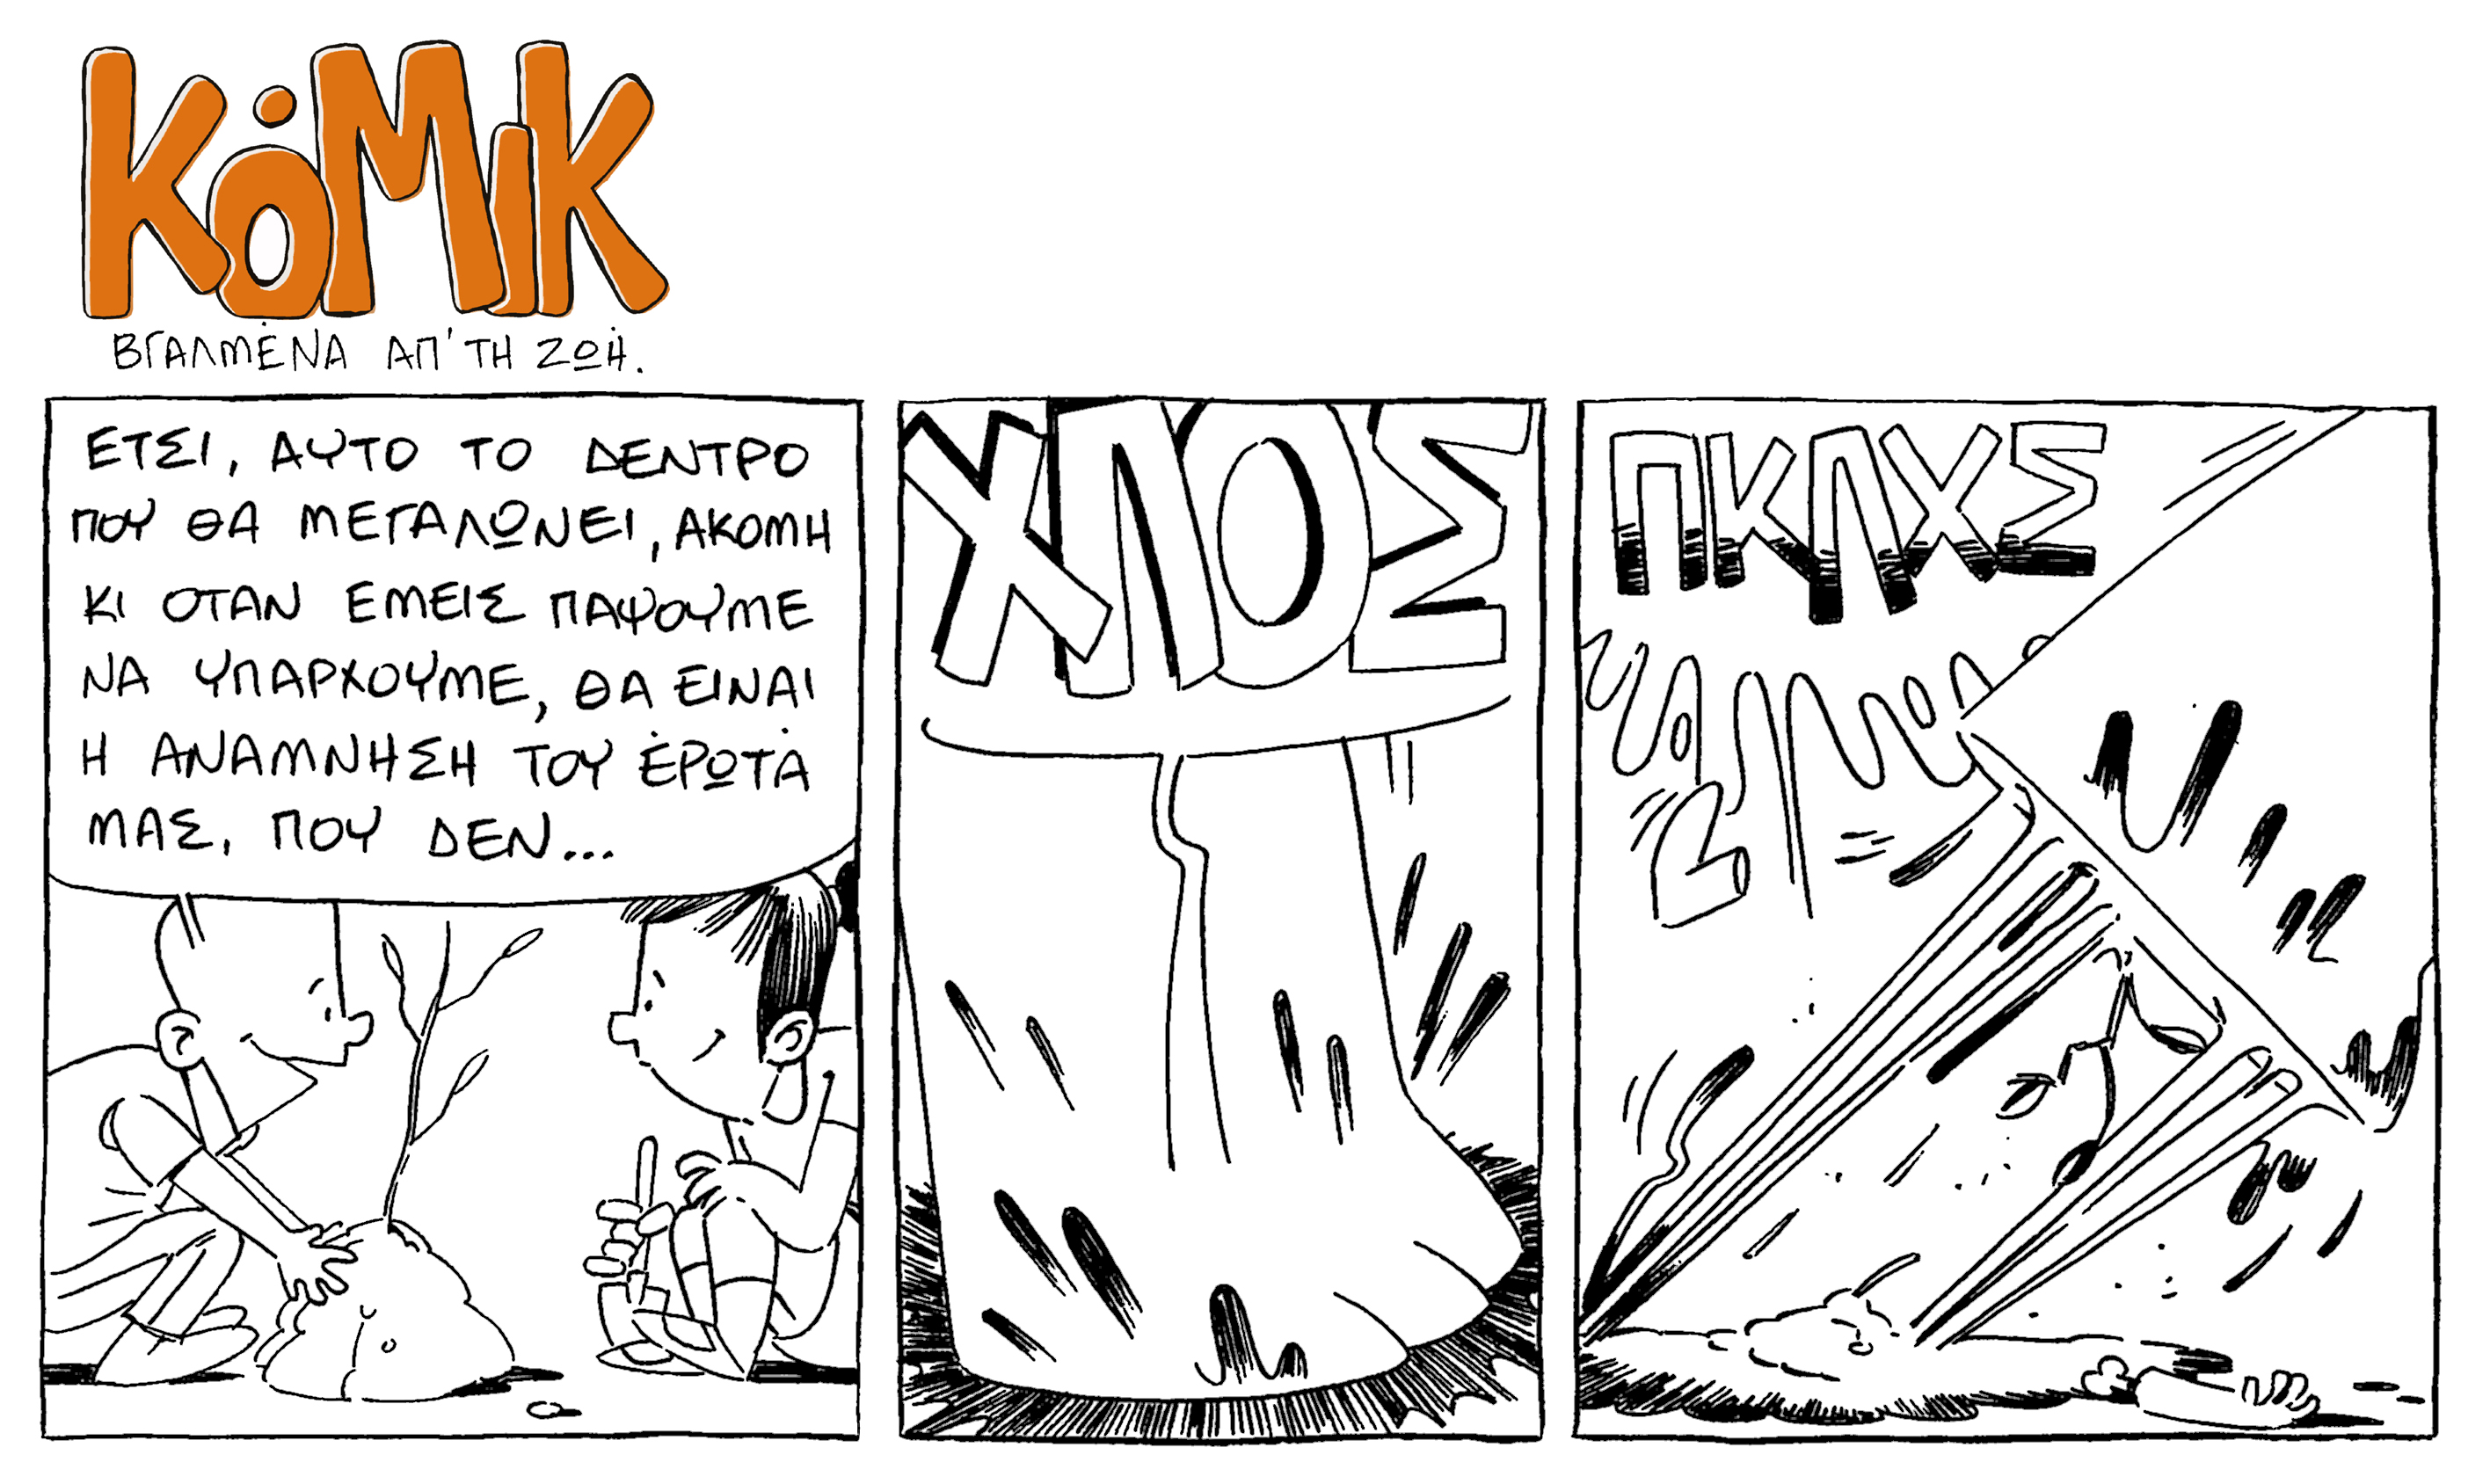 komik20